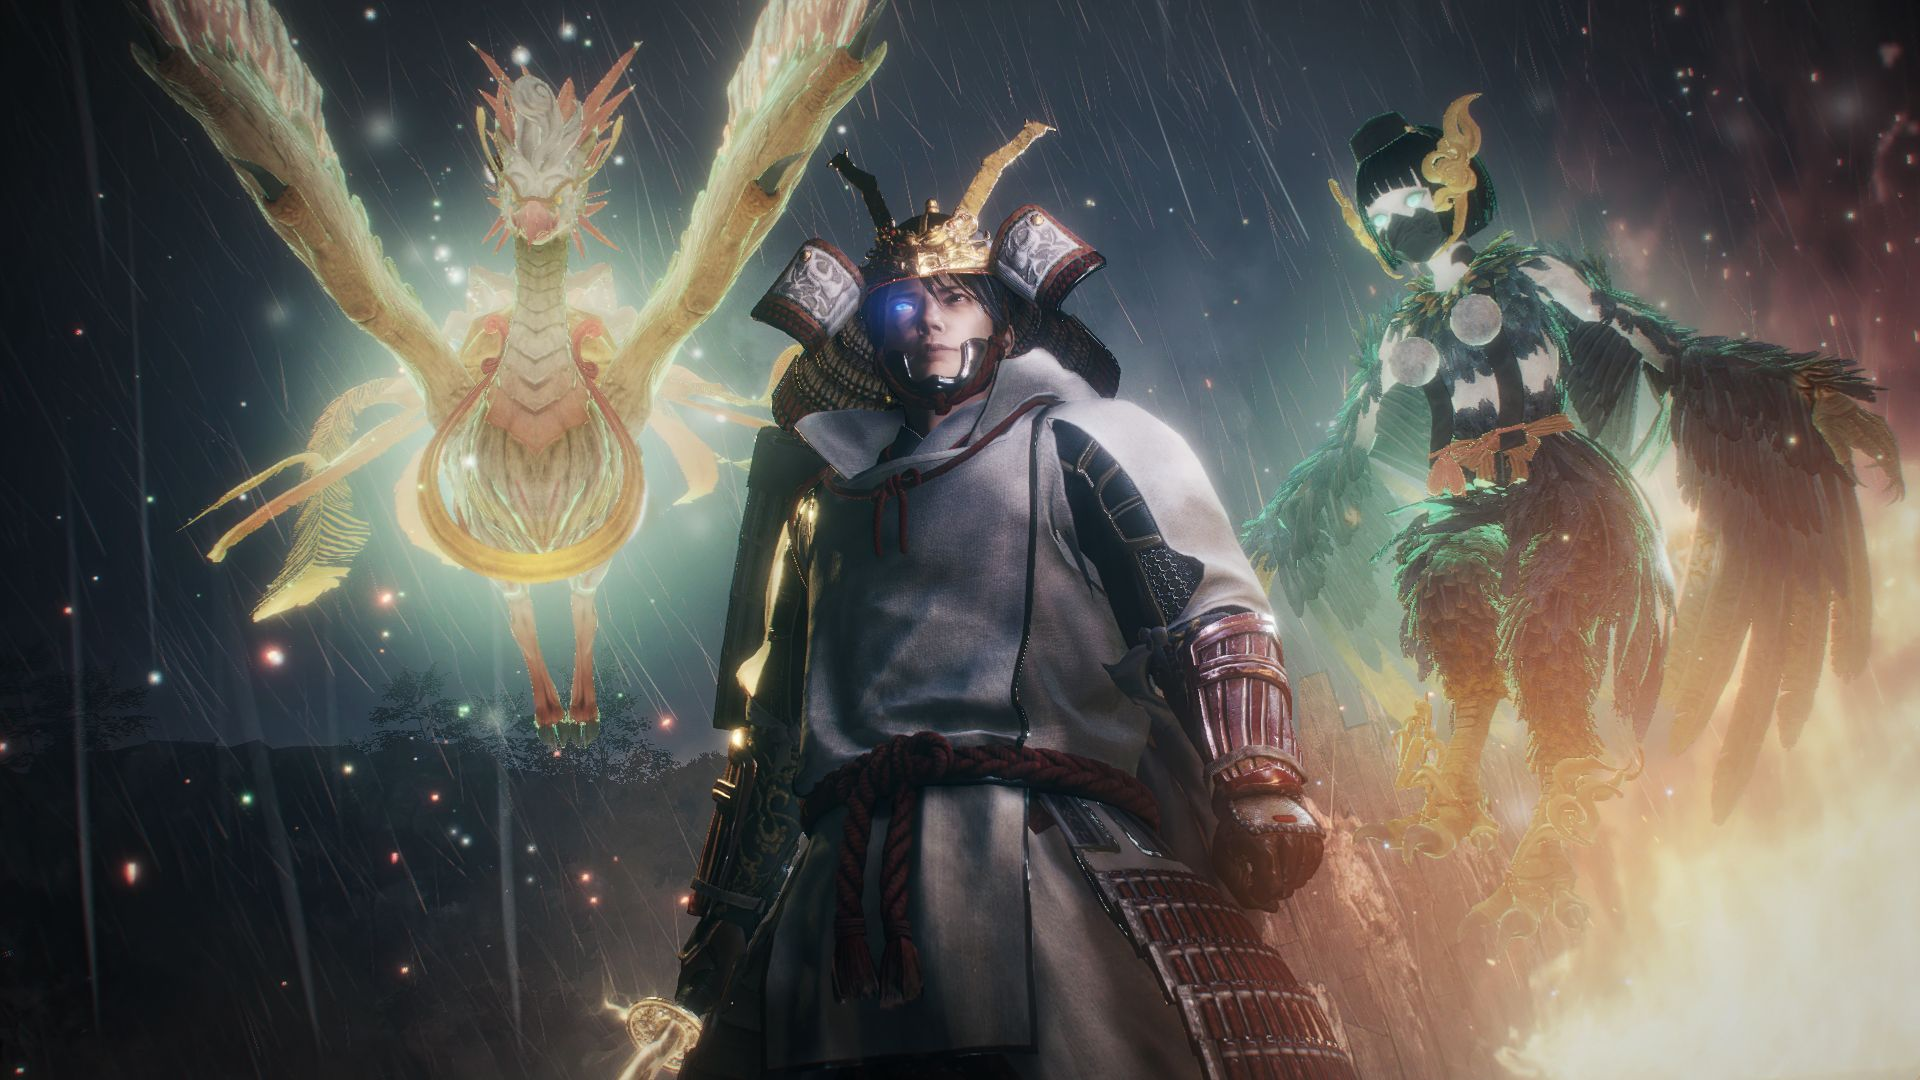 Nioh 2 - The Tengu's Disciple